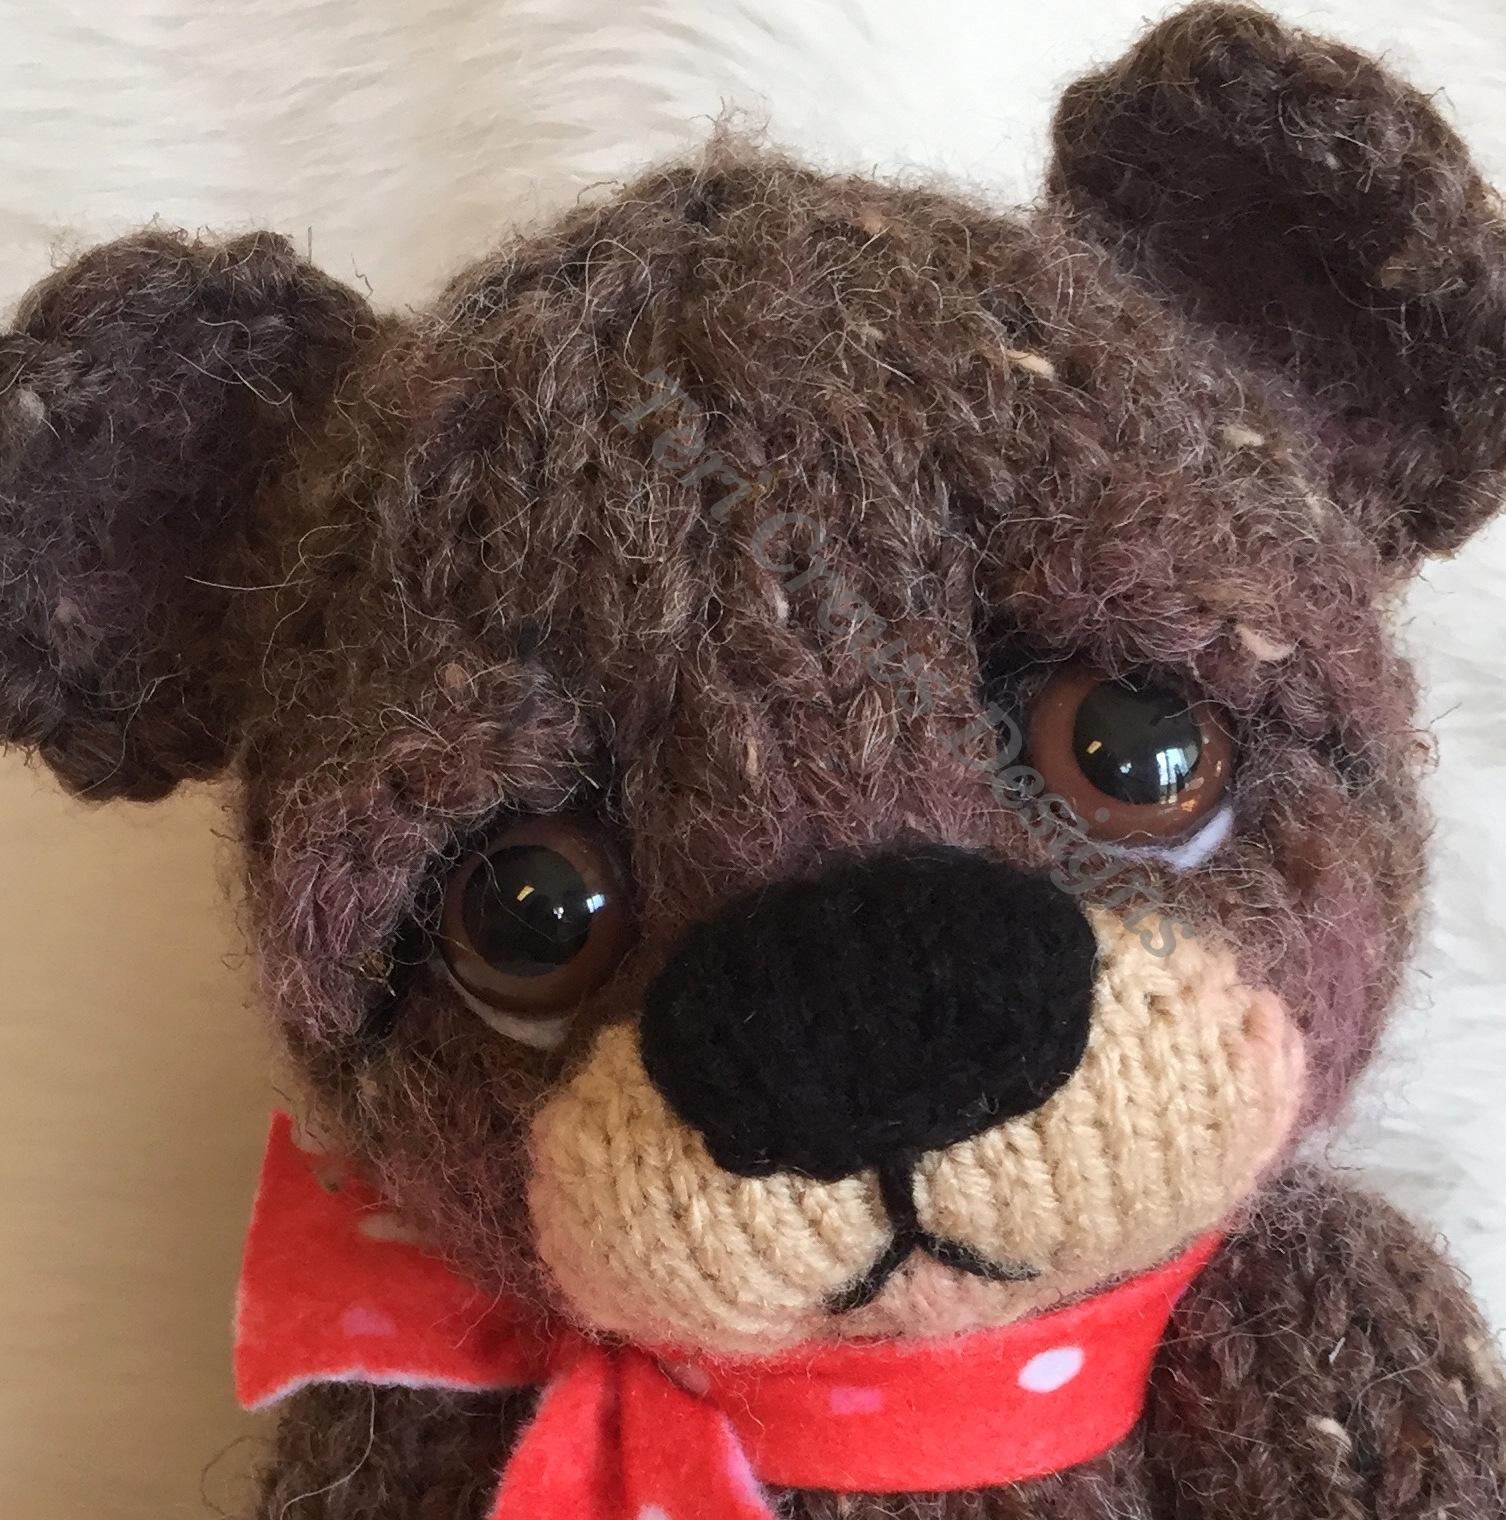 Latest Knitting Patterns : Teris Blog: New Sweet Knit Bear A Knitting Pattern At Last